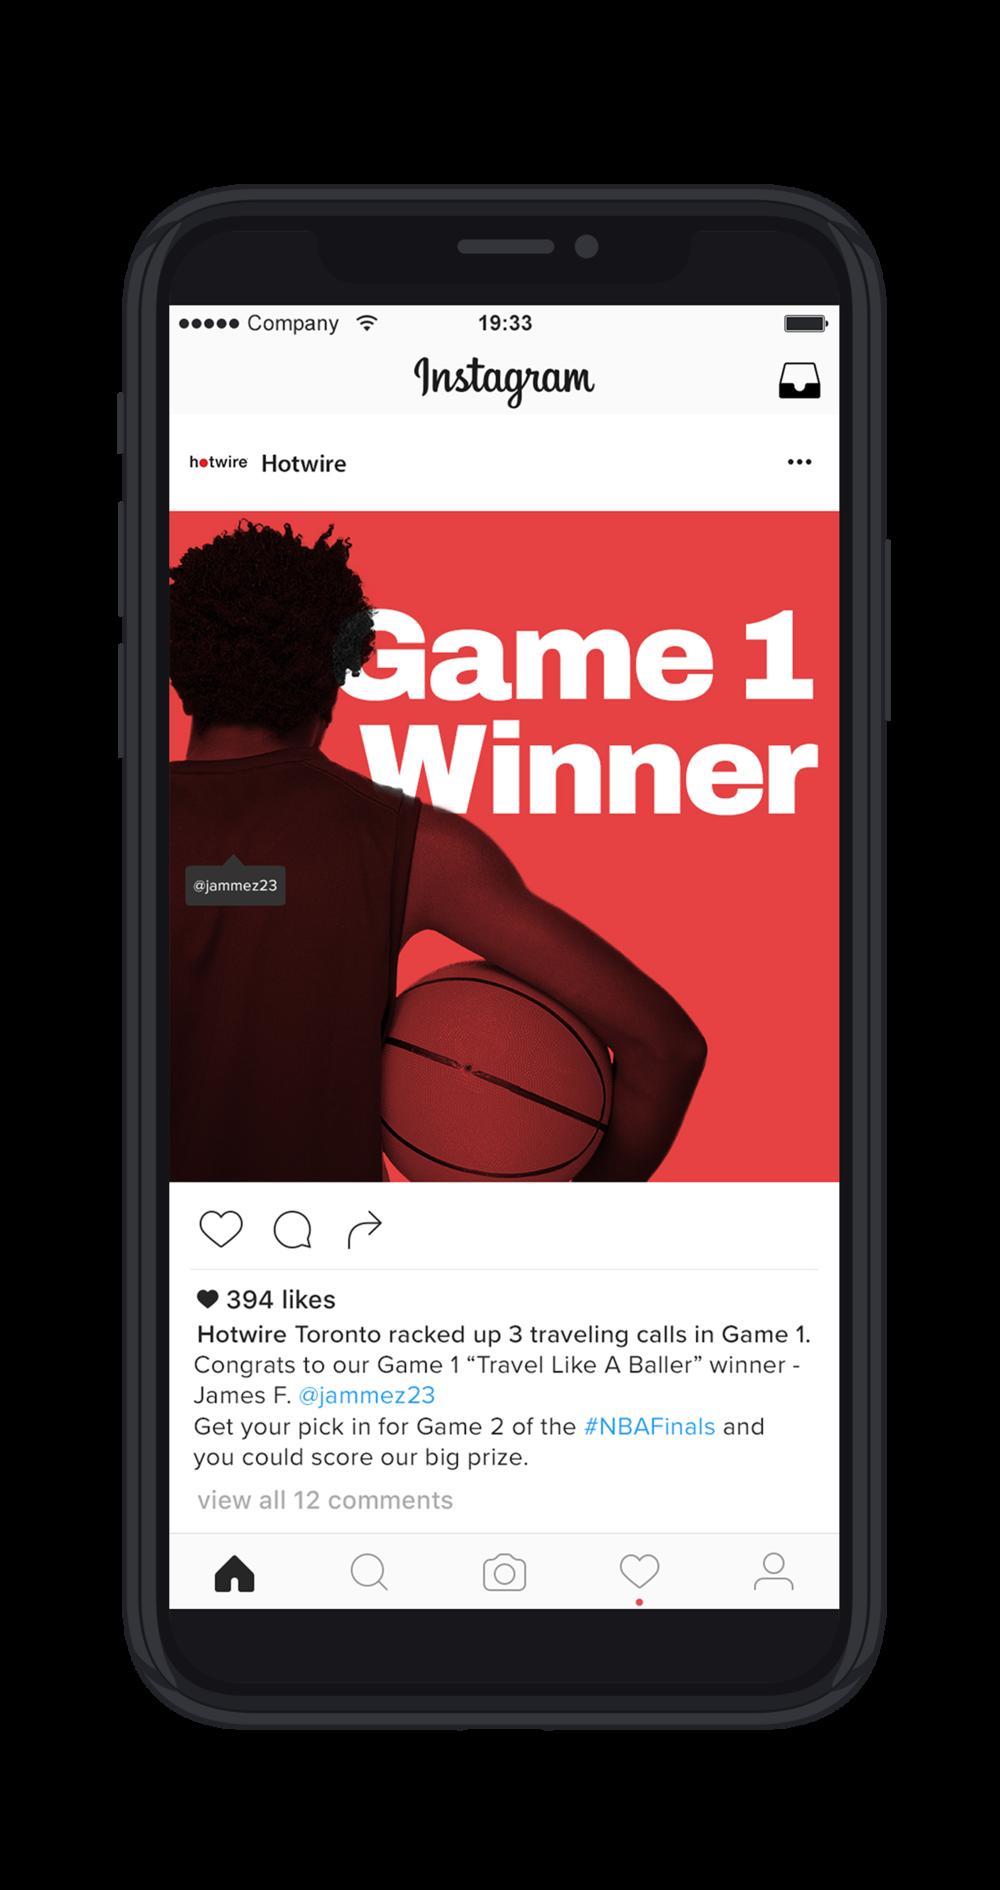 game1winner.png